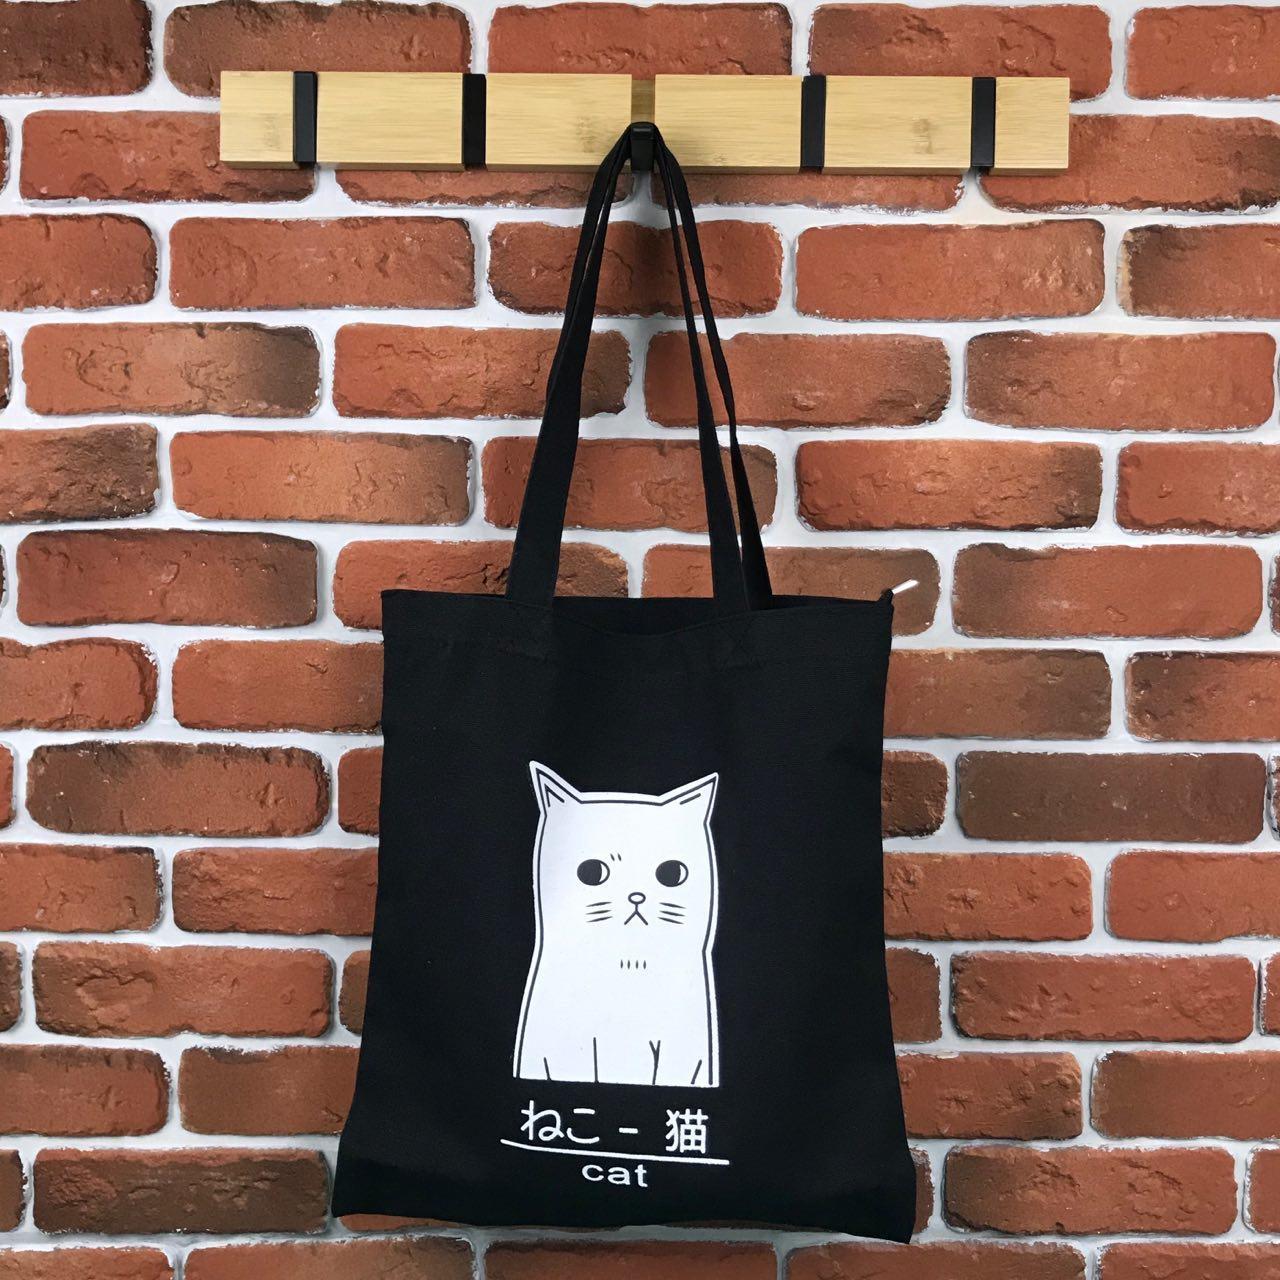 Тканевая сумка Шоппер City-A Cat Кот Черная